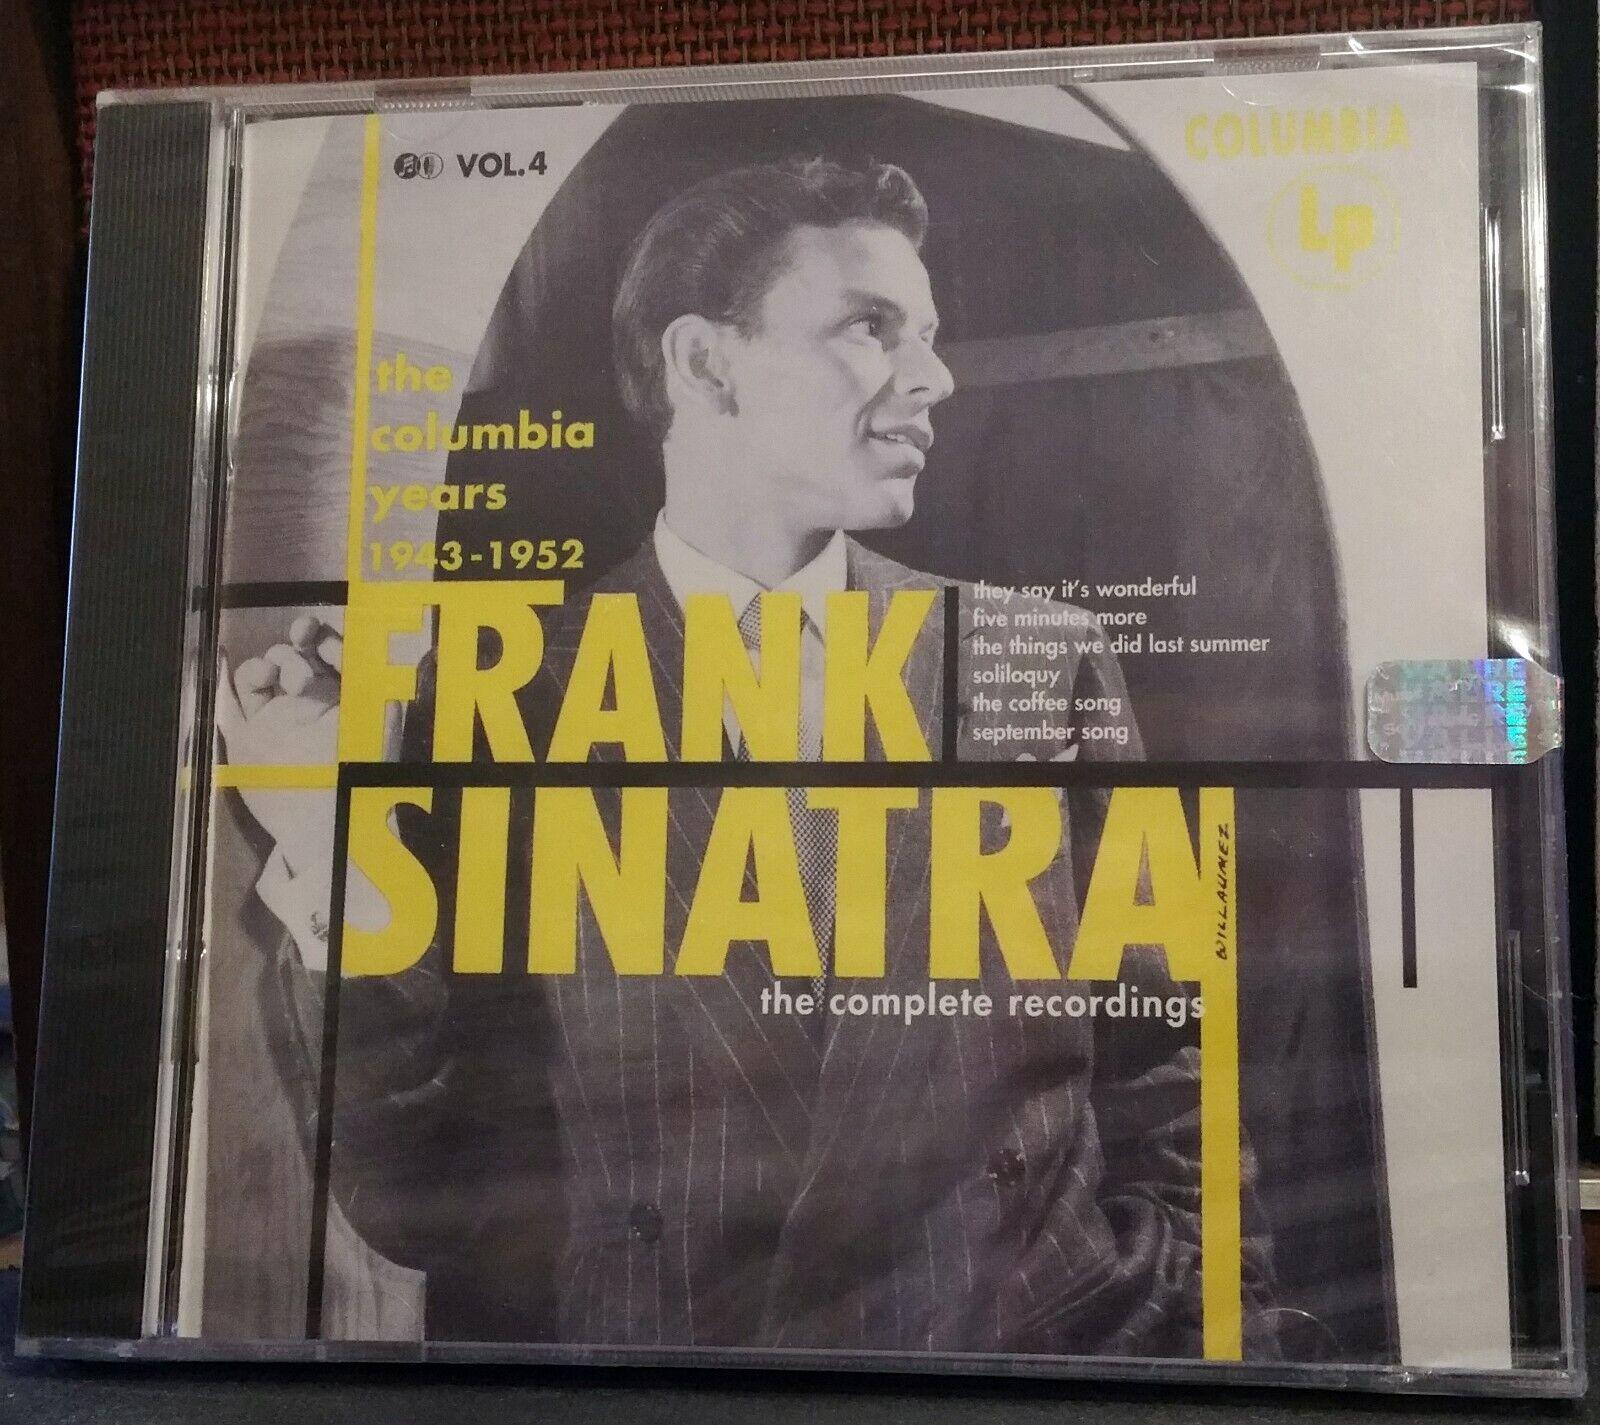 FRANK SINATRA The Columbia Years 1943-1952 Volume 4 CD, 1993, Columbia  - $6.99